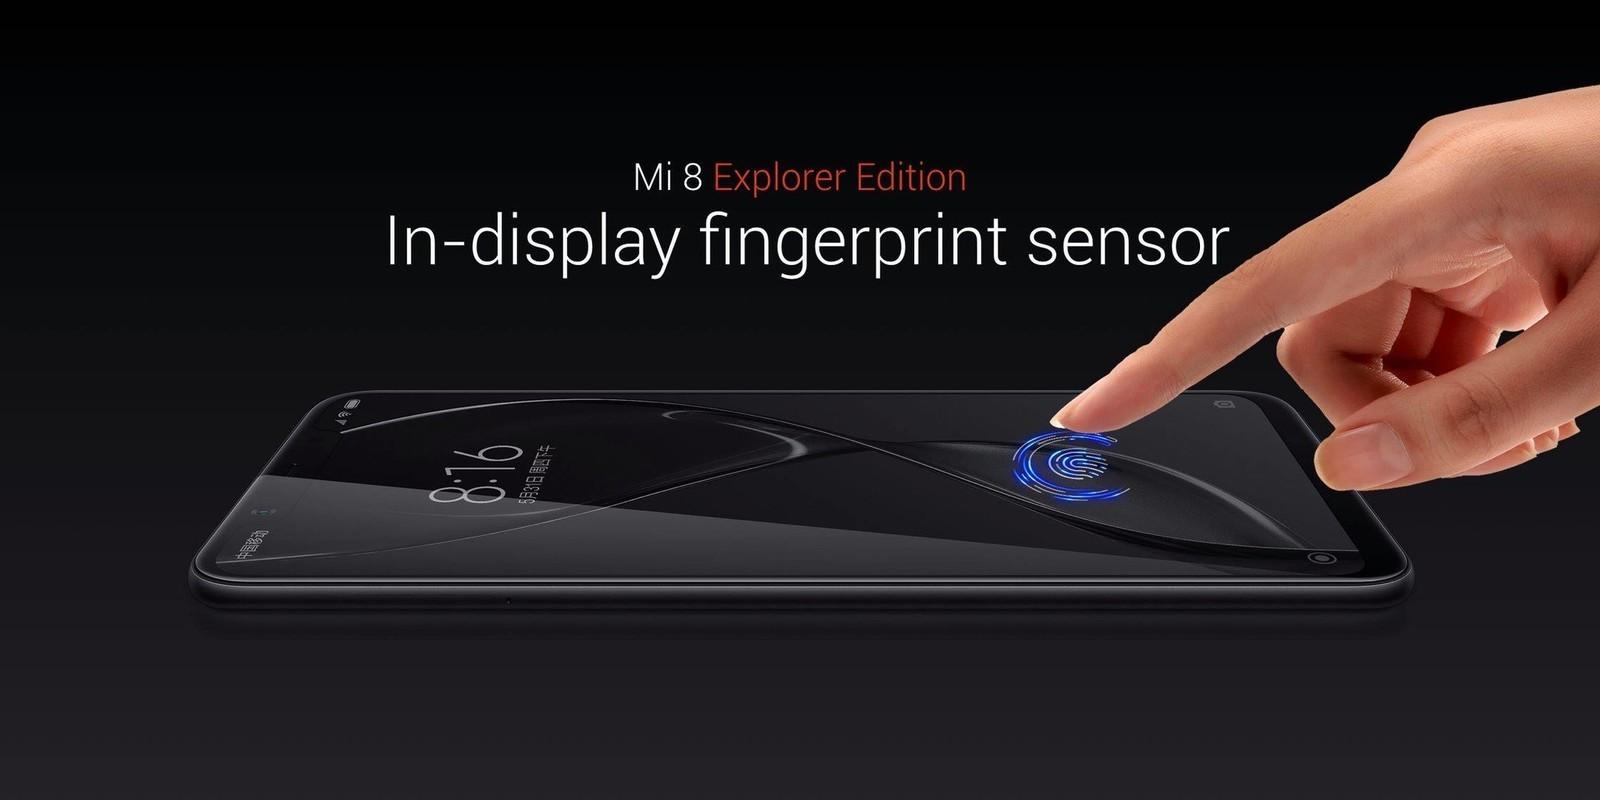 xiaomi-mi-8-explorer-edition.jpg